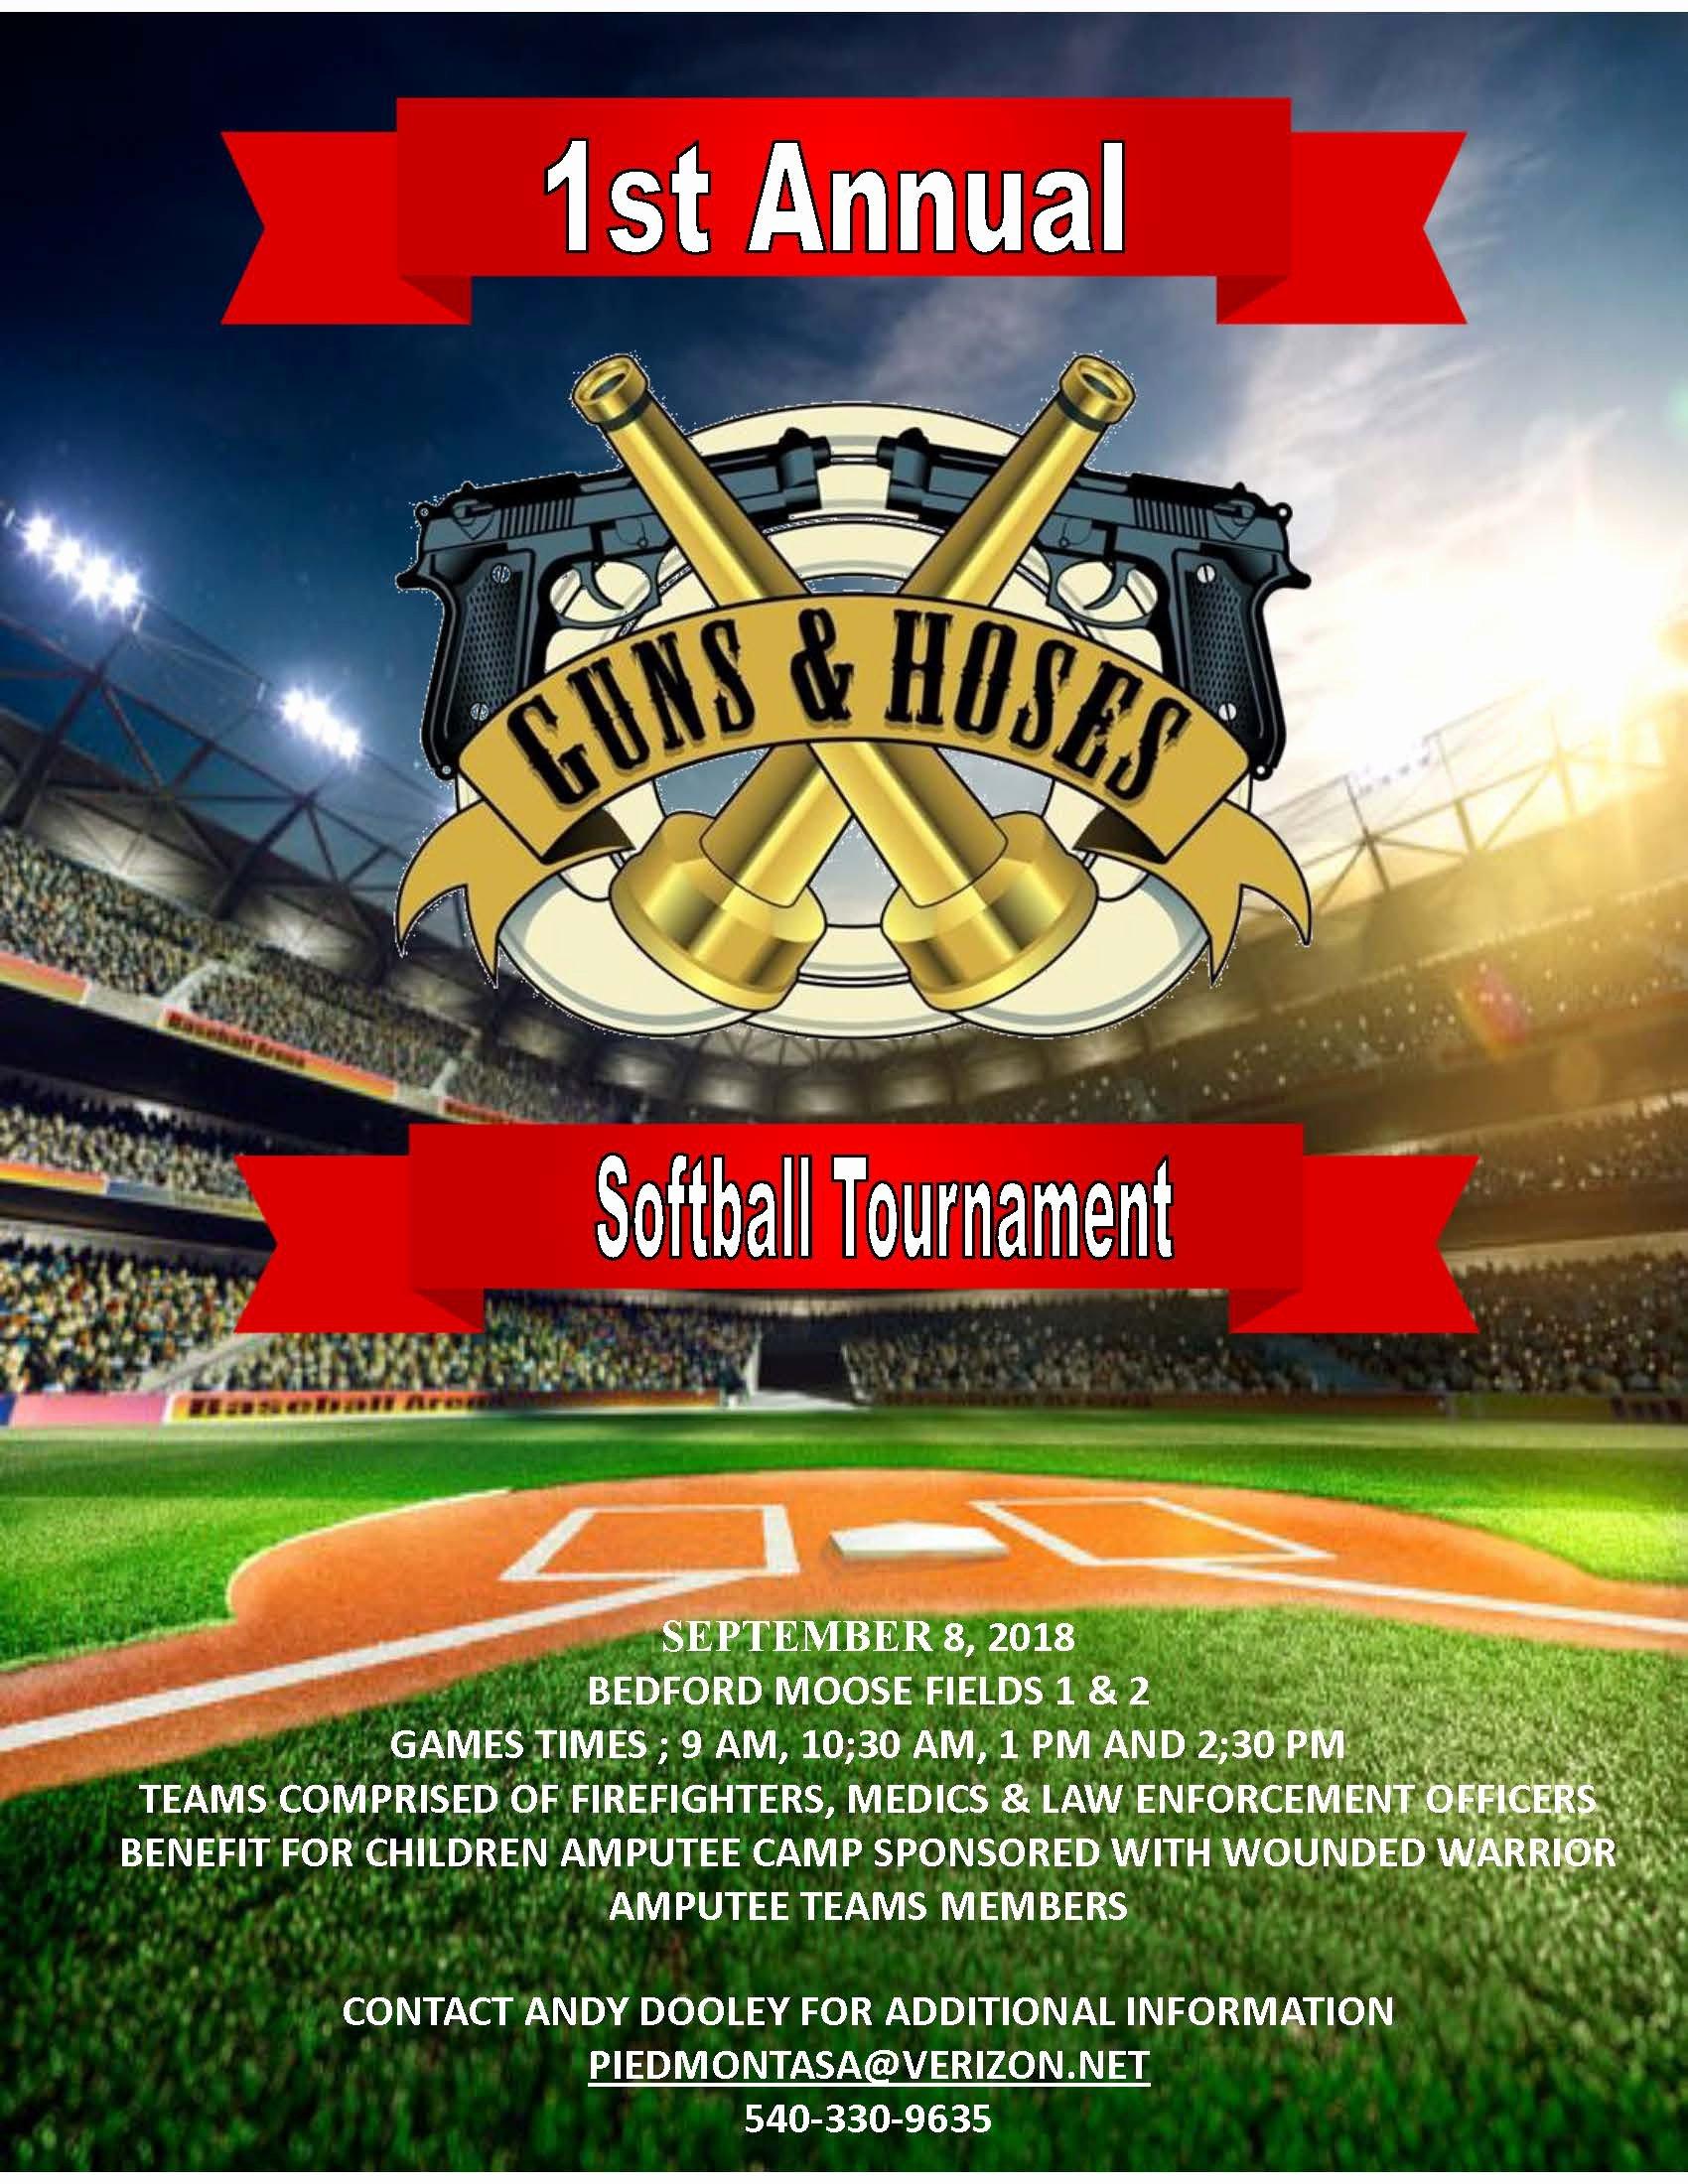 Softball tournament Flyer Template Beautiful softball tournament Flyer